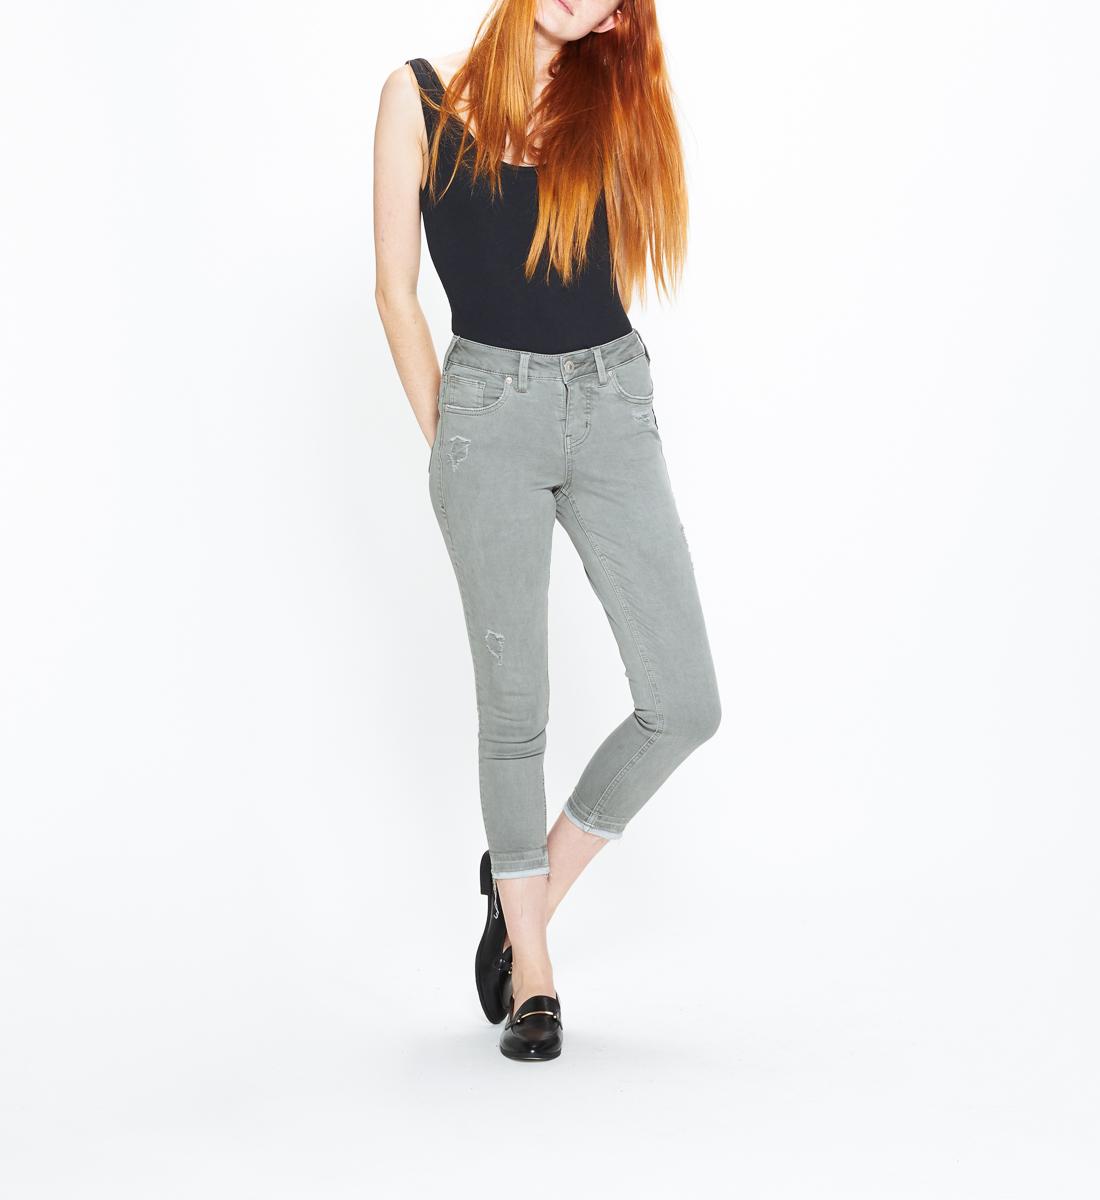 5db91127 Avery Skinny Crop Color Wash, Sage, hi-res. SKU # L44908SAC018. Silver Jeans